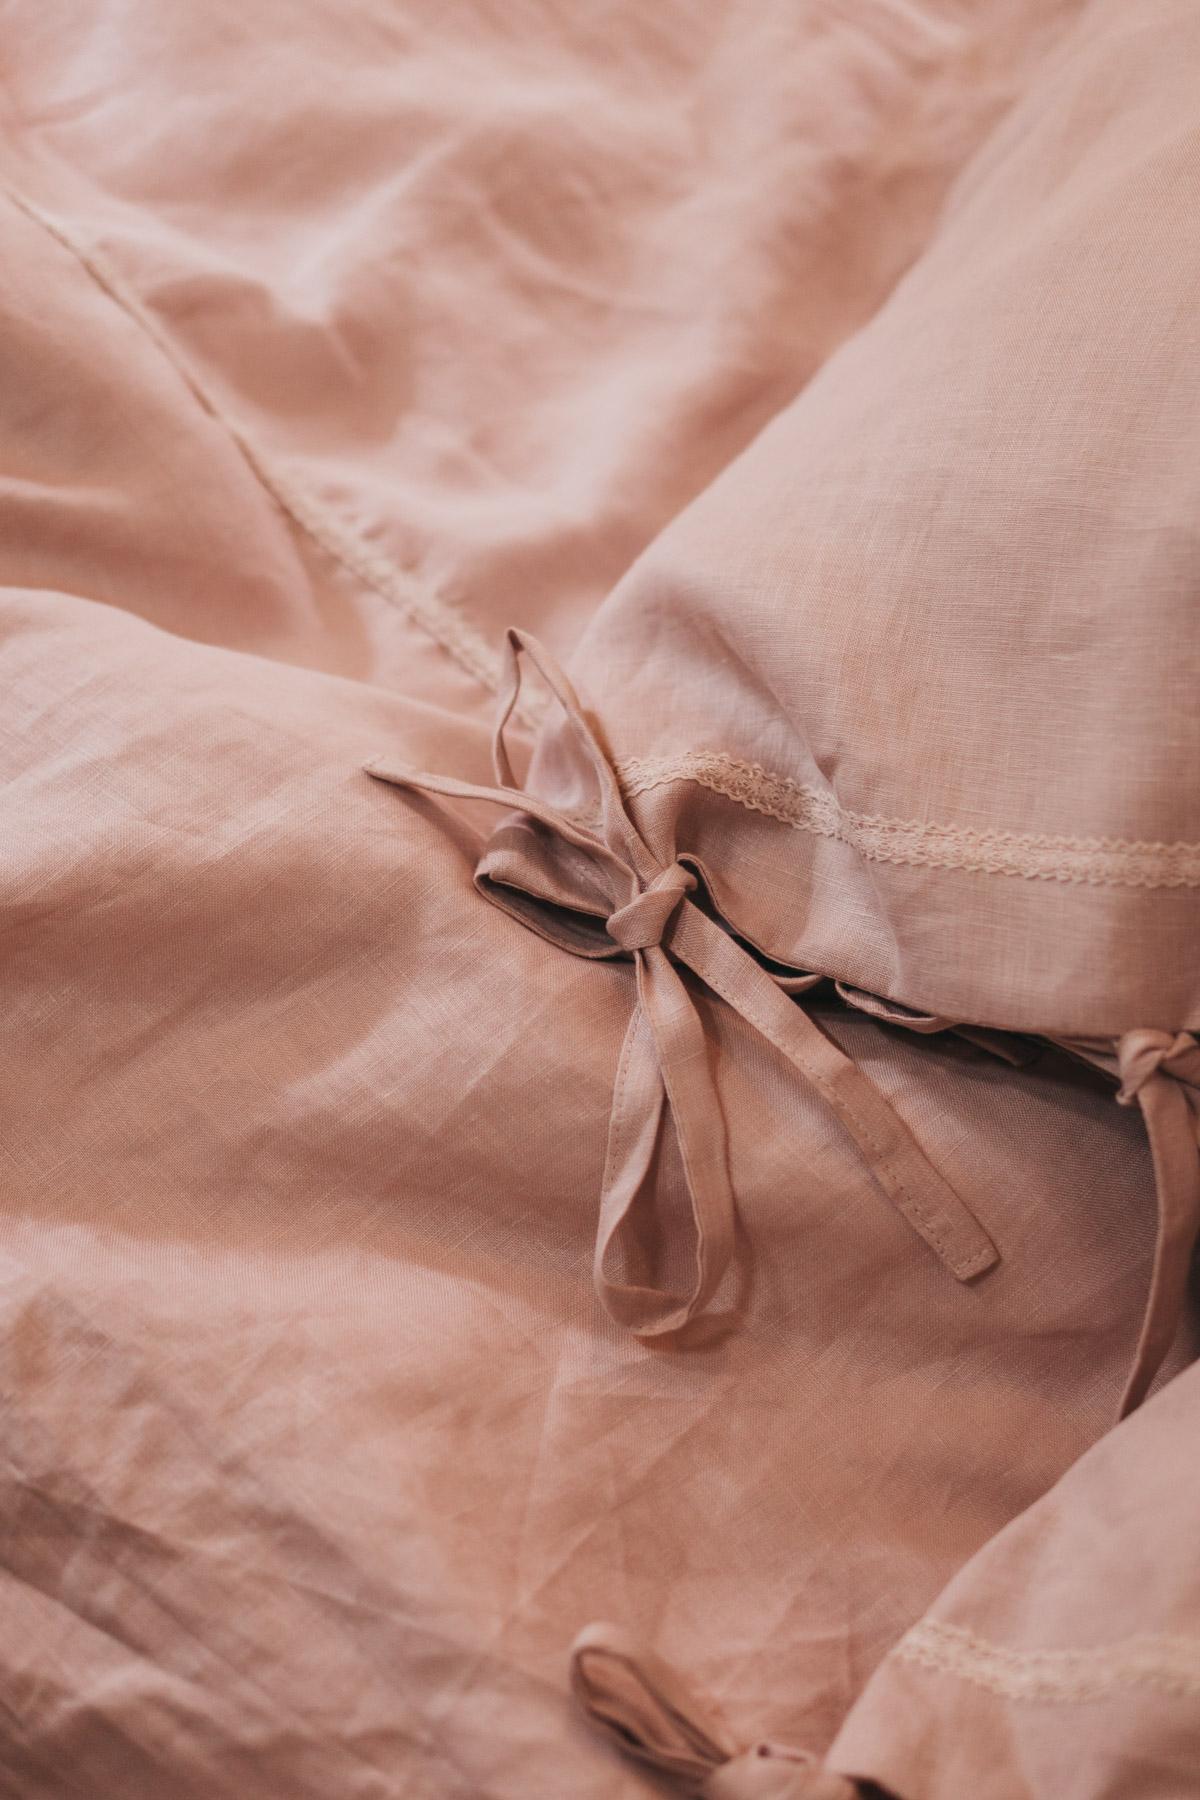 Keira-Mason-in-between-the-sheets-bow.jpg